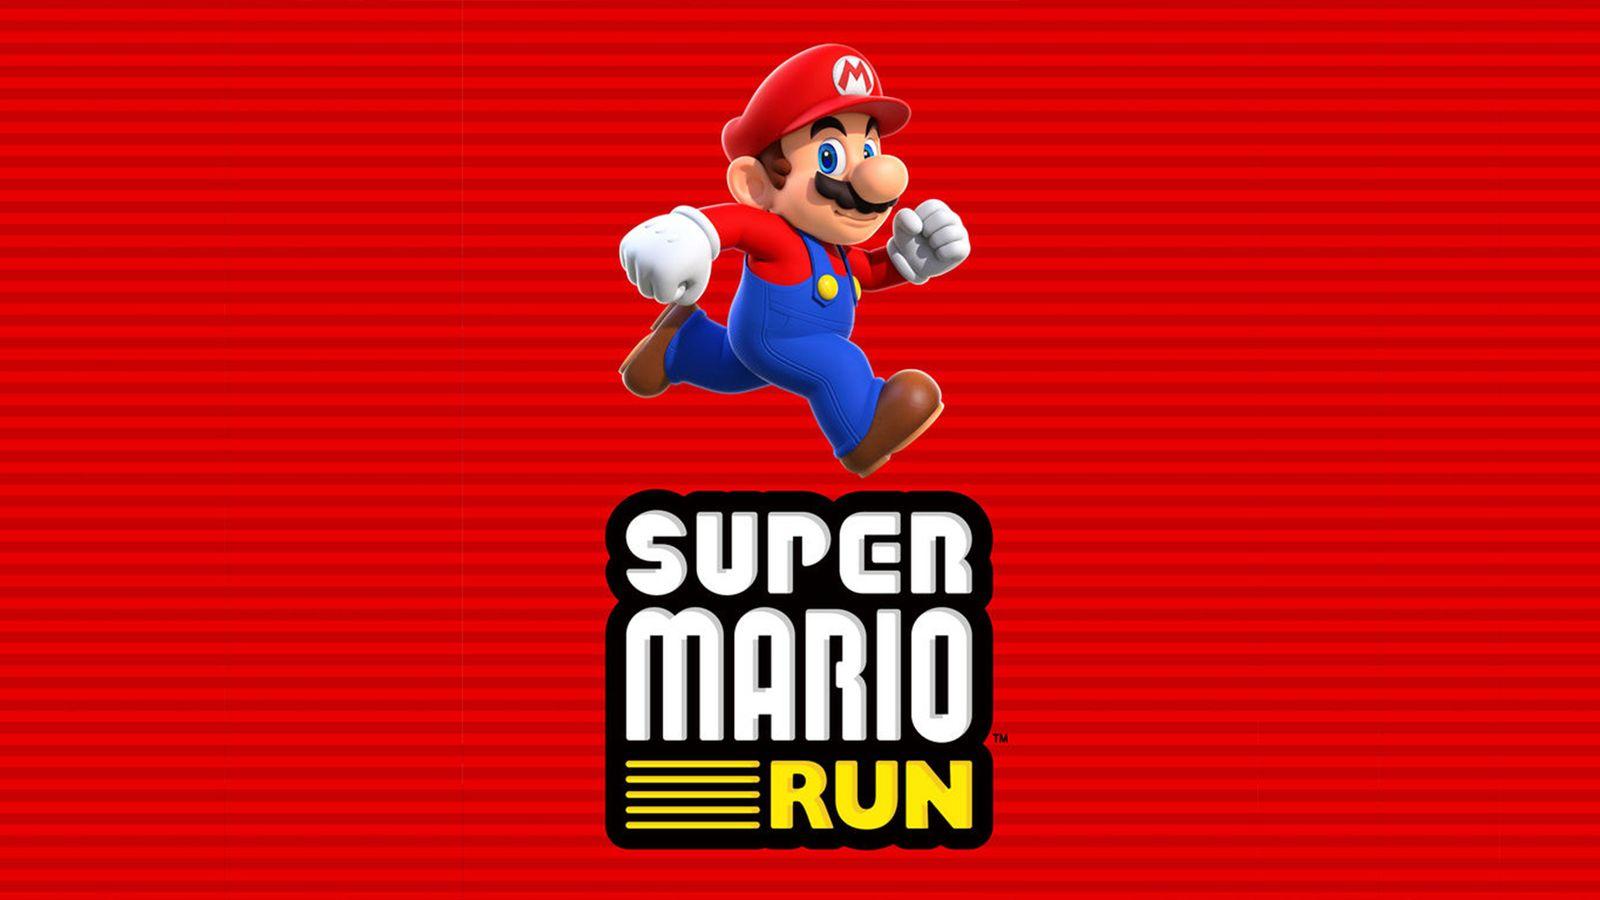 Run to an Apple Store Today to Play a Super Mario Run Demo